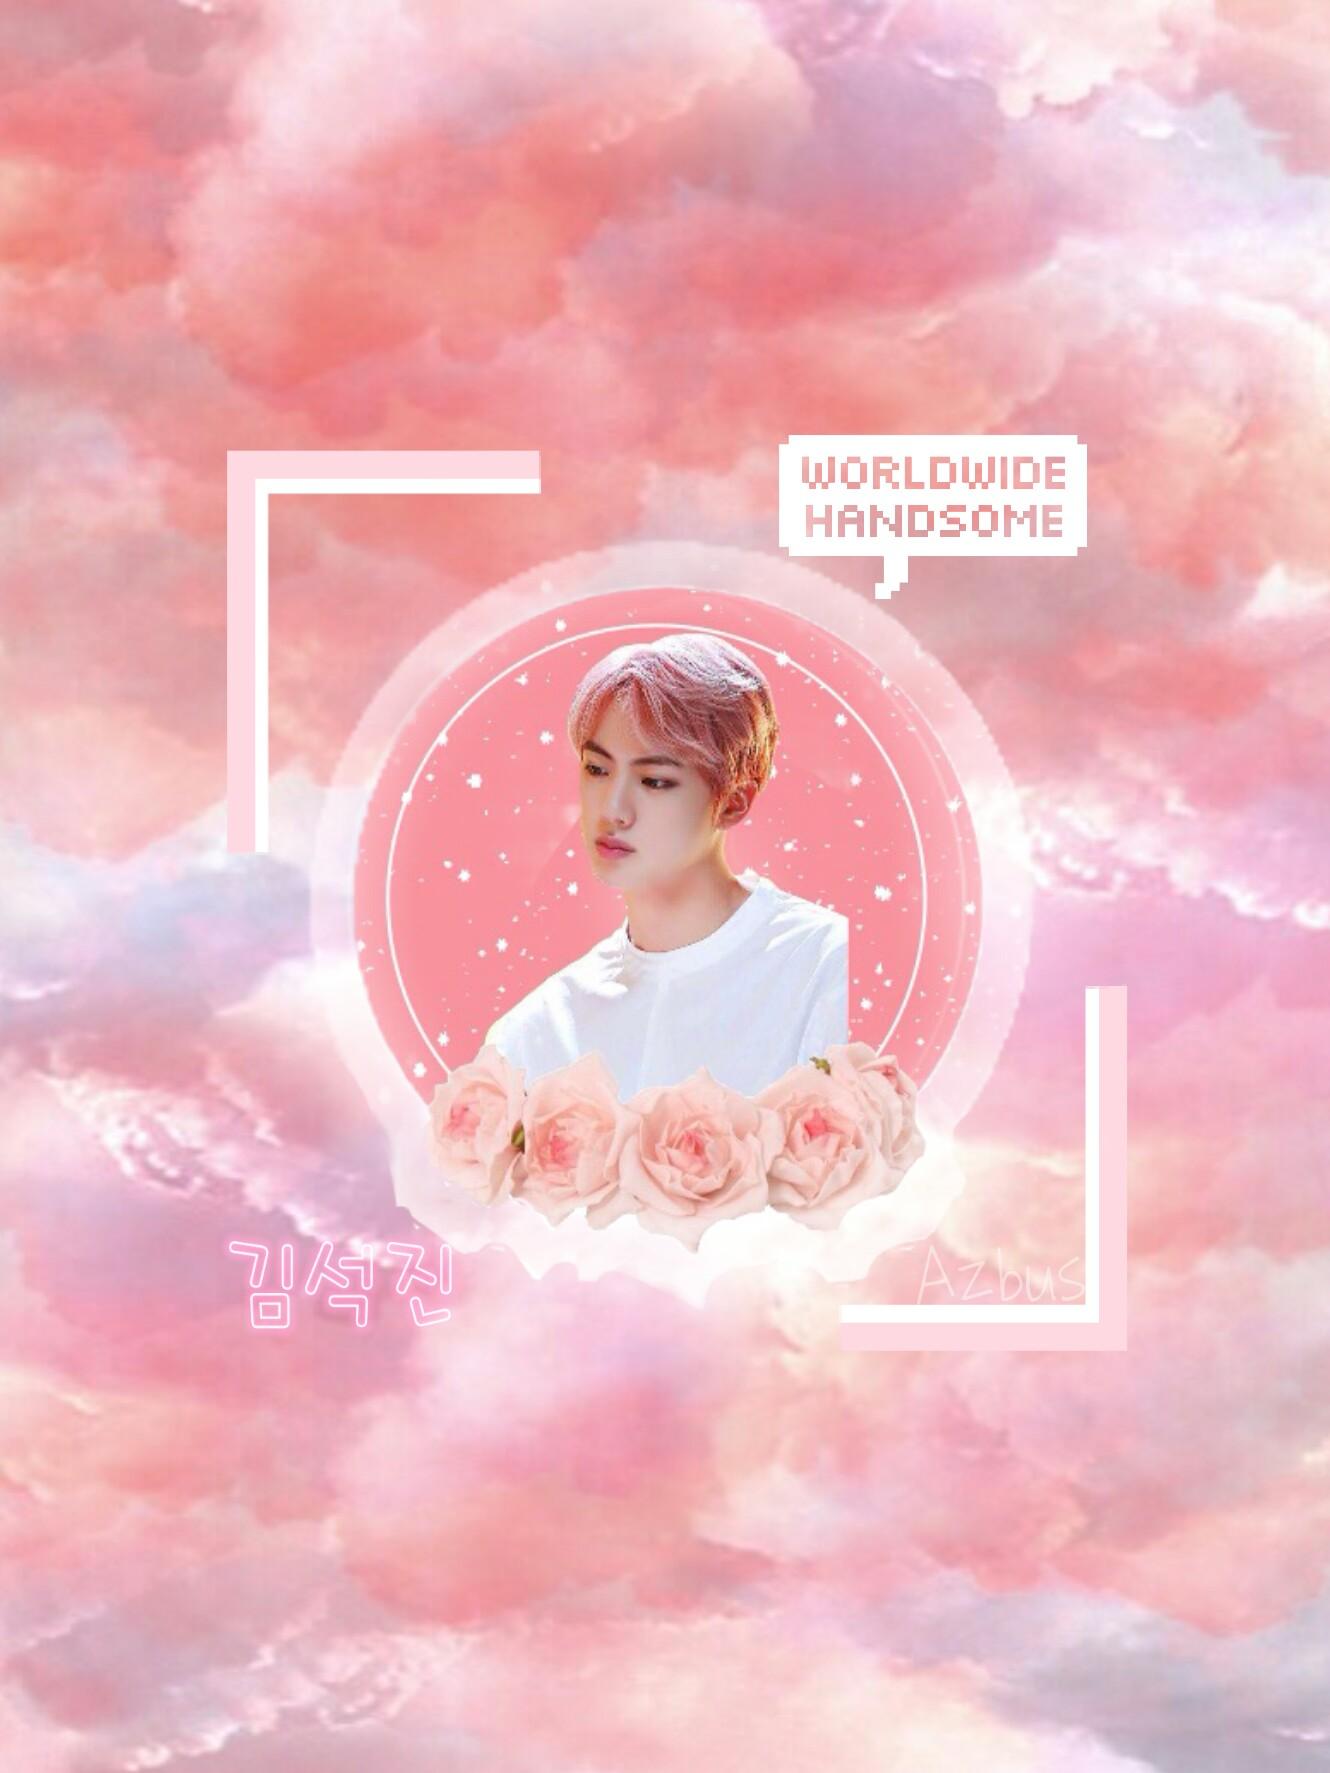 Bts Jin Kpop Hbd Kpopwallpaper Wallpaper Aesthetic Aesthetic Kpop Wallpaper Bts 83594 Hd Wallpaper Backgrounds Download